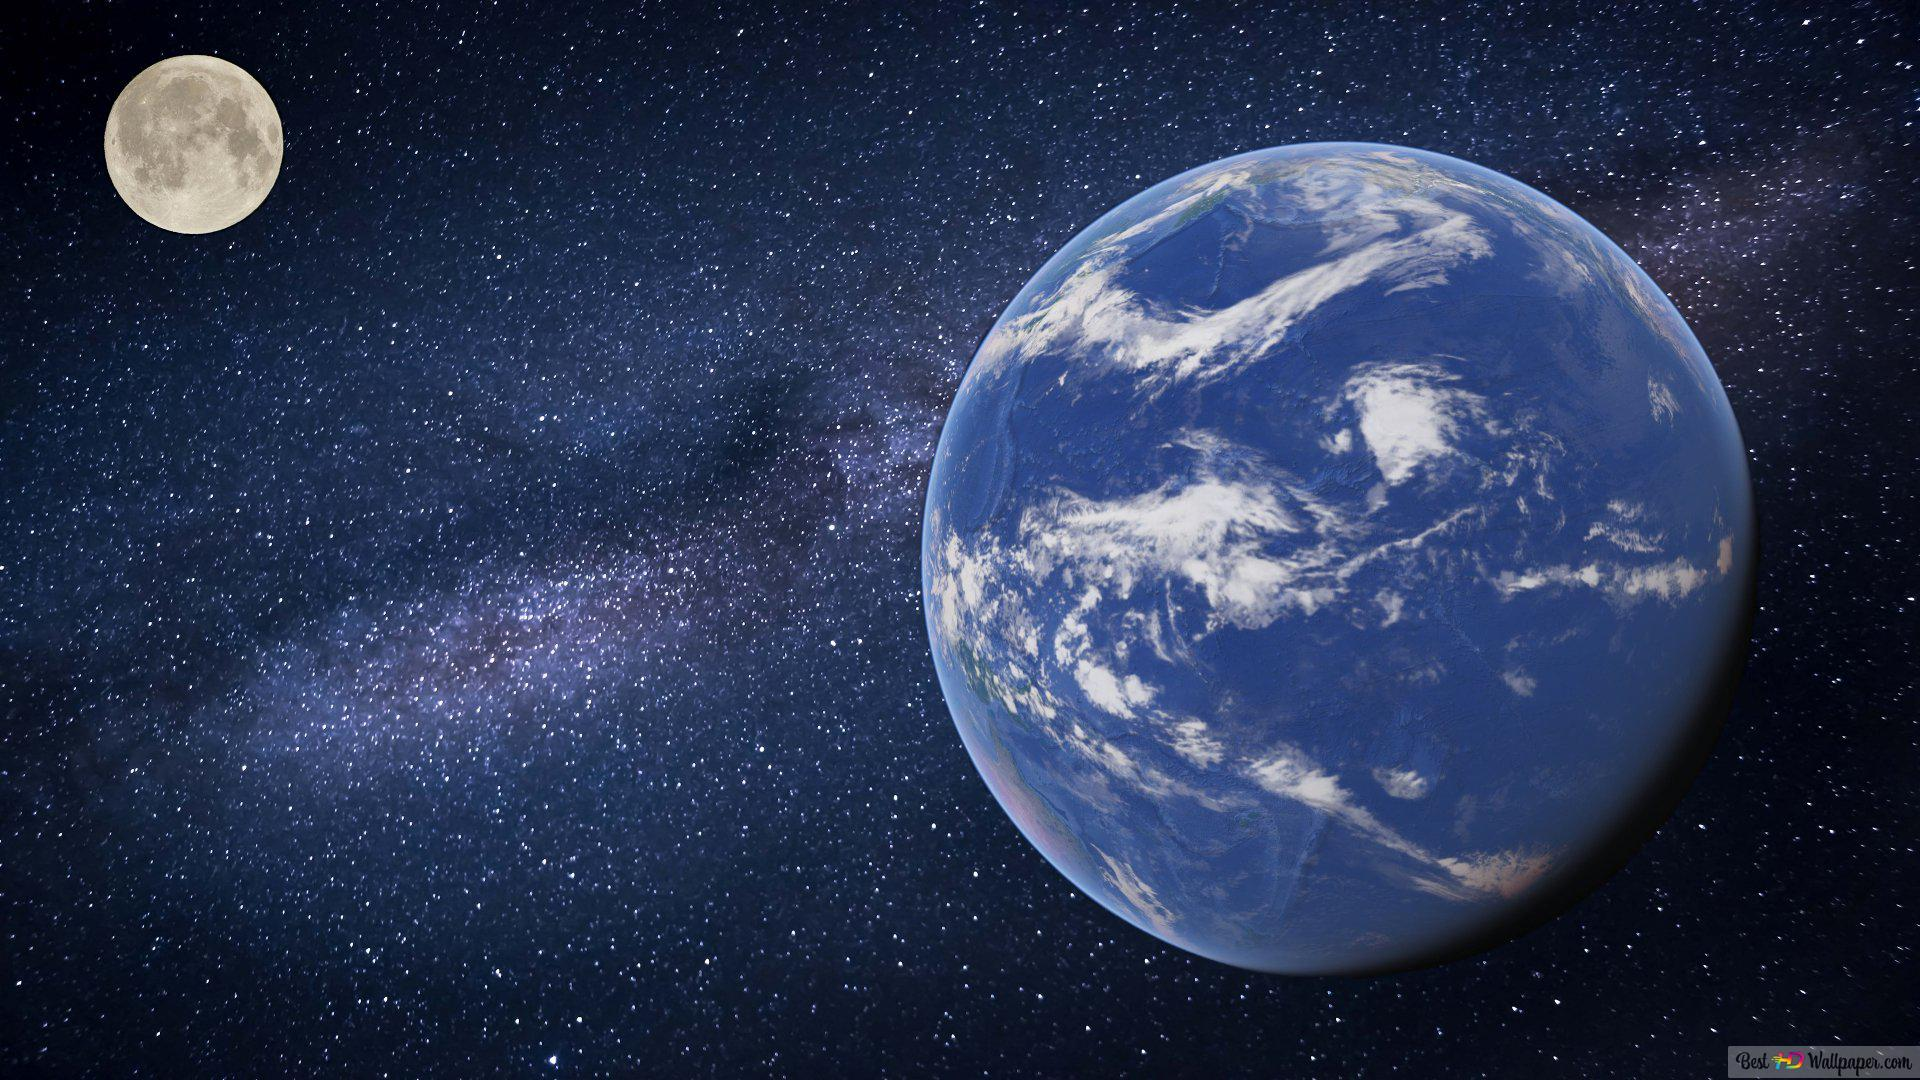 Blue Planet Earth Hd Wallpaper Download